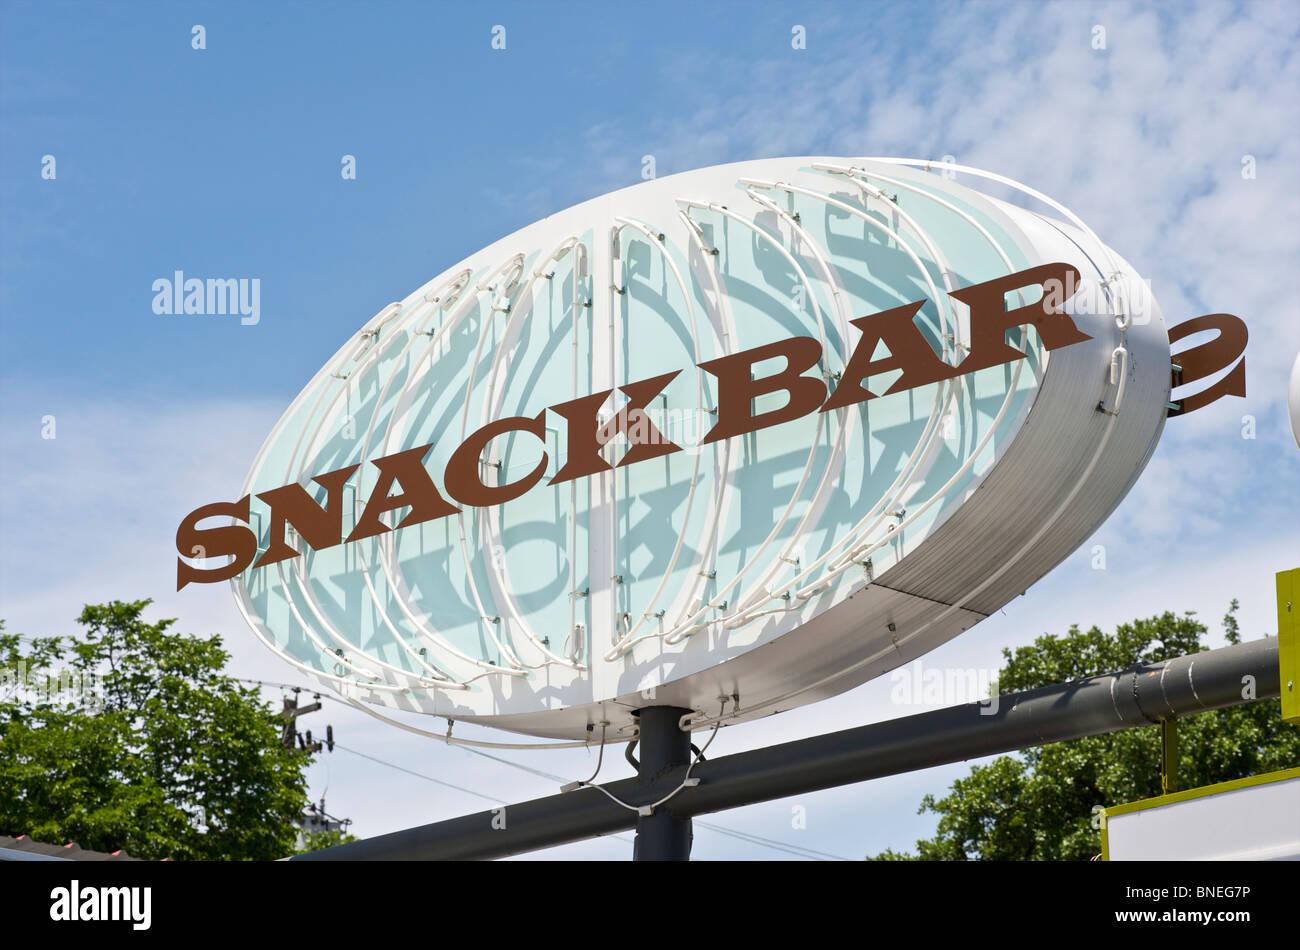 Neon-Schild-Snack-Bar, Austin, Texas, USA Stockfoto